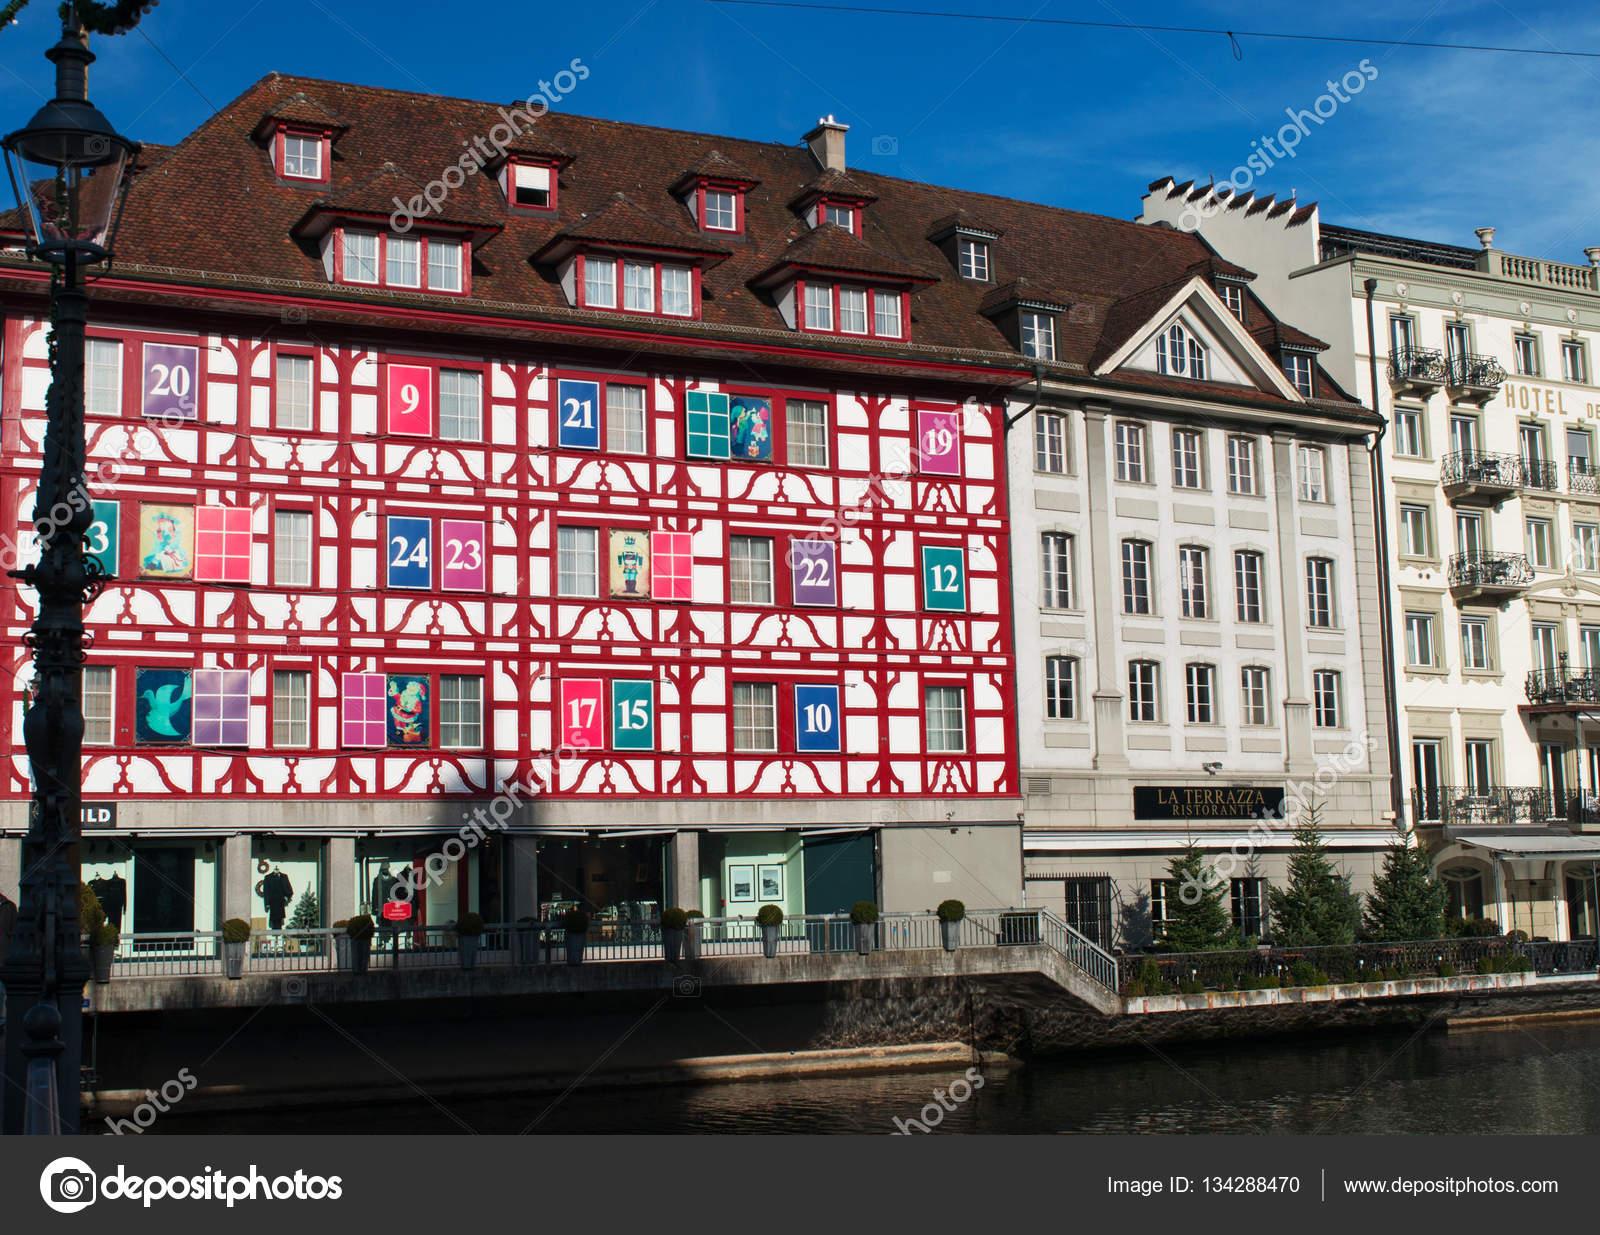 Switzerland An Advent Calendar Building In Lucerne Stock